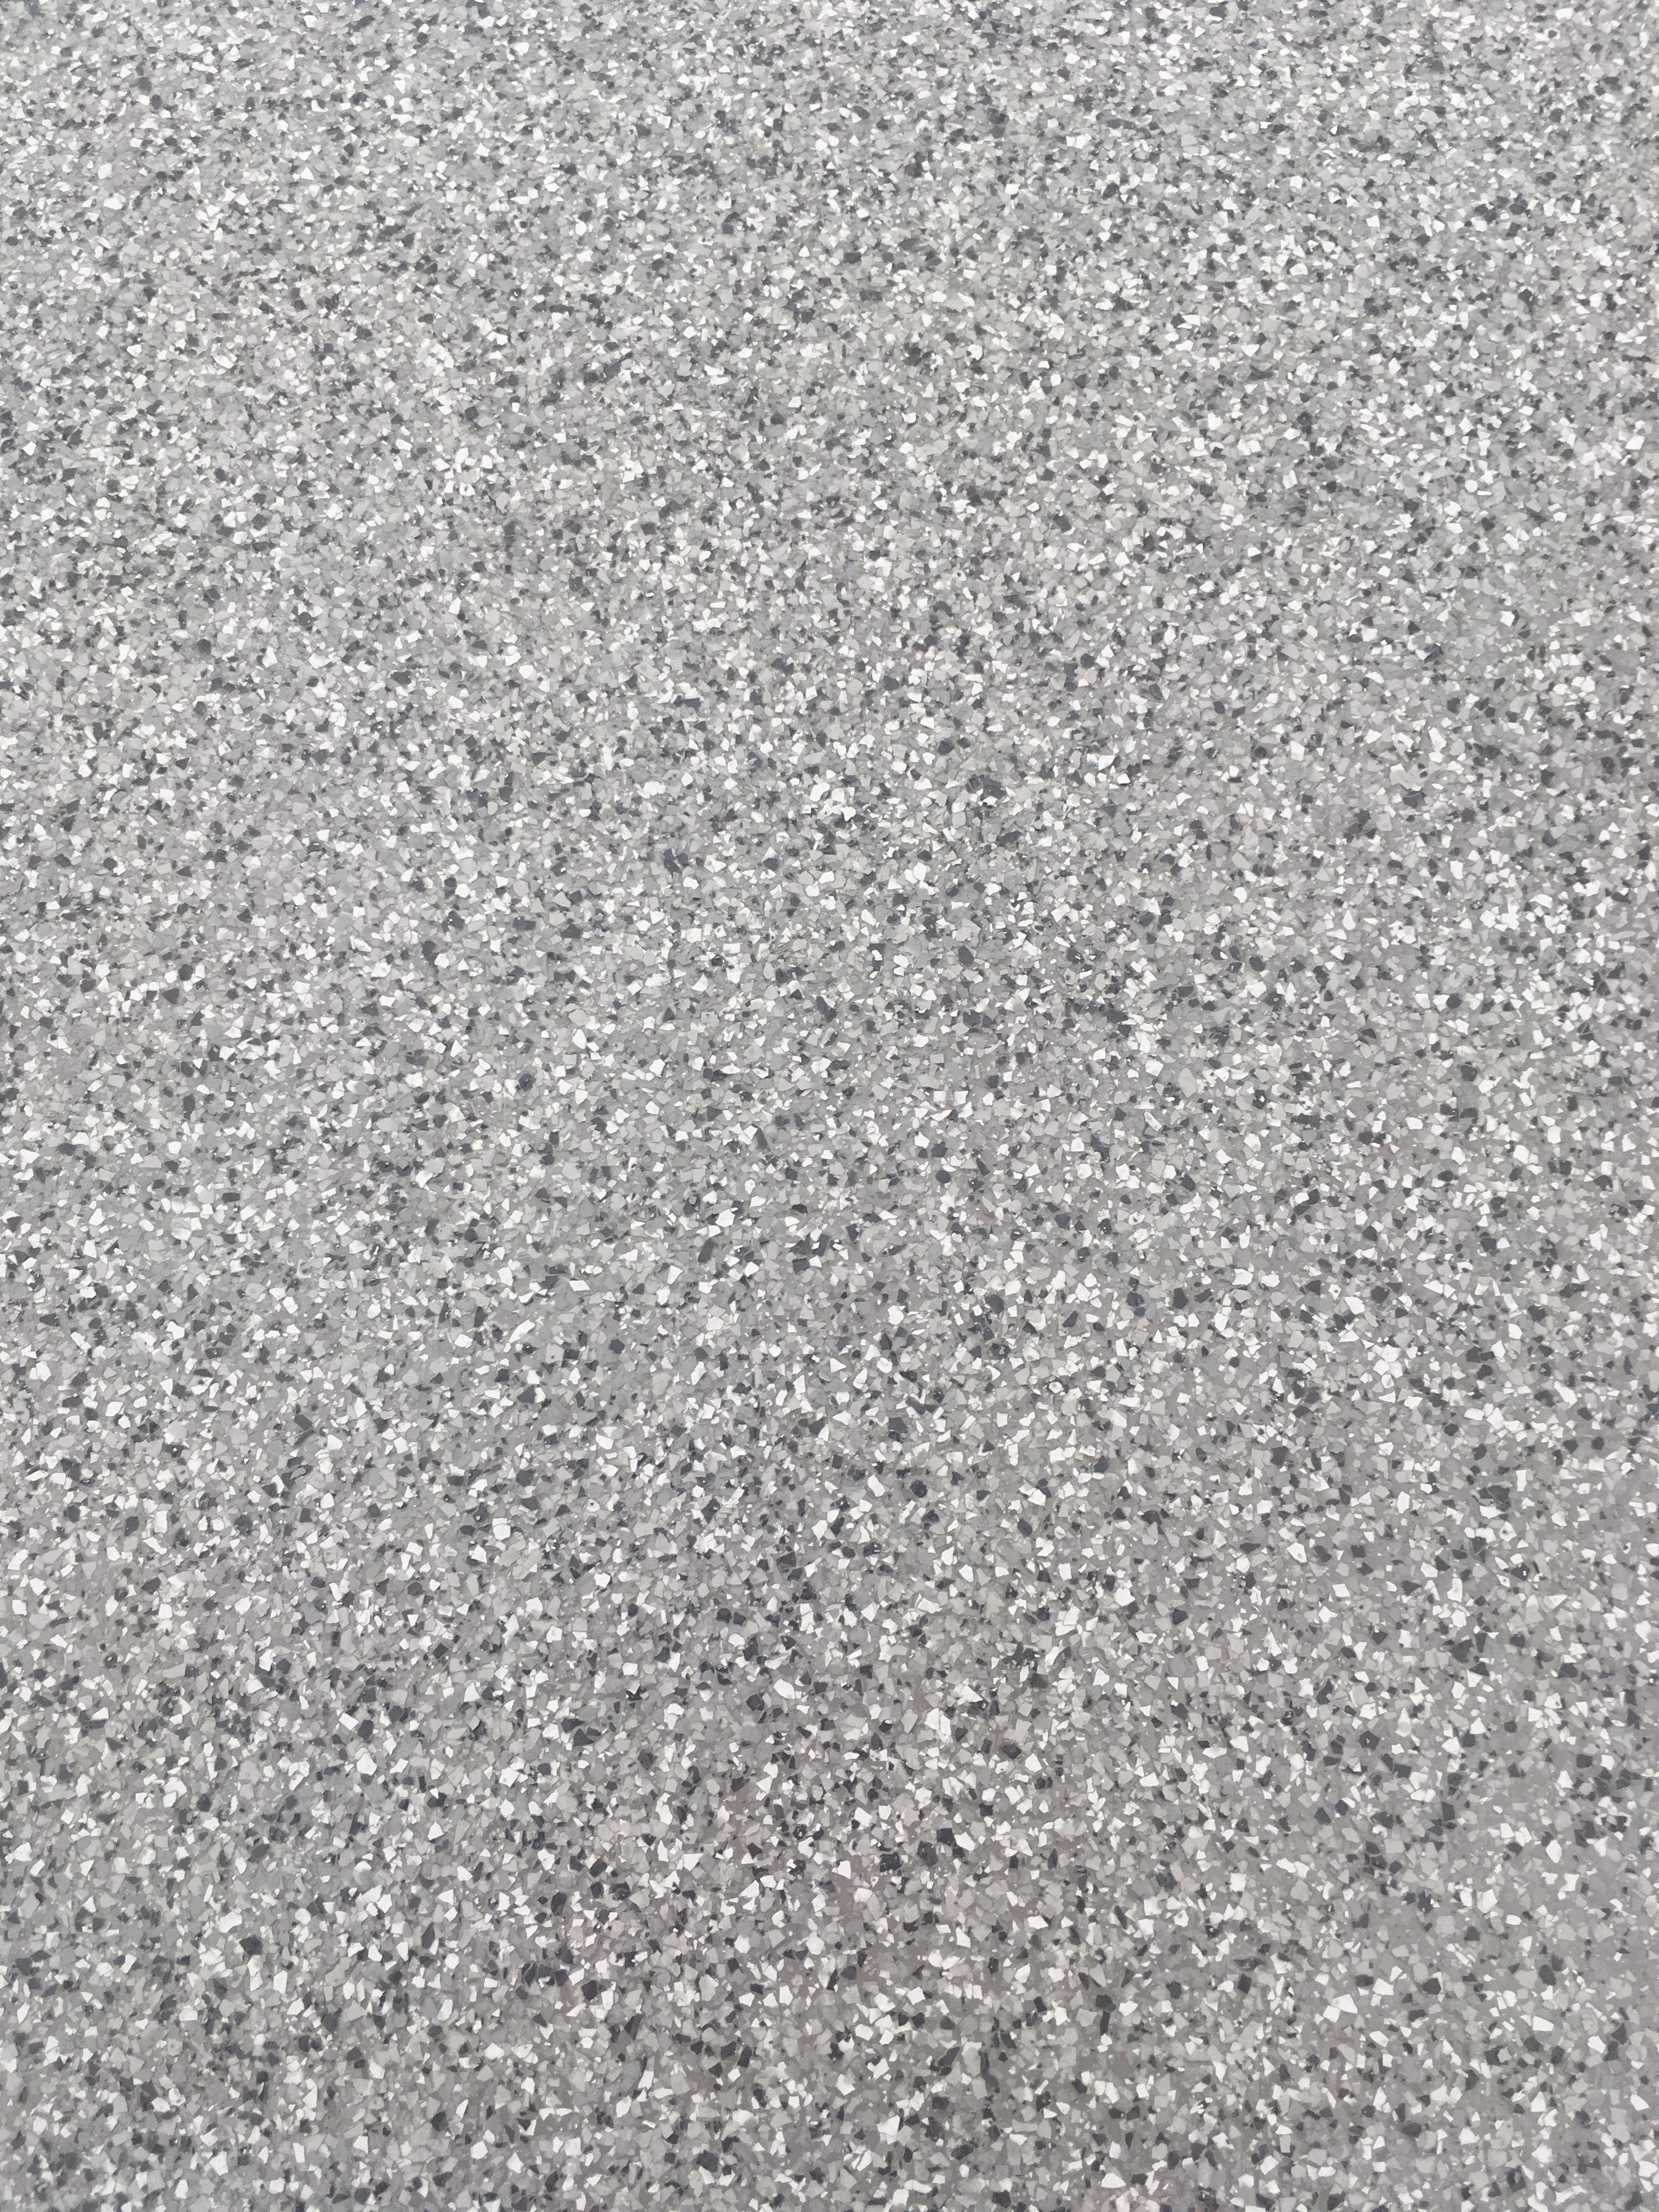 Flake Epoxy Flooring By The Garage Floor Co At Noosa